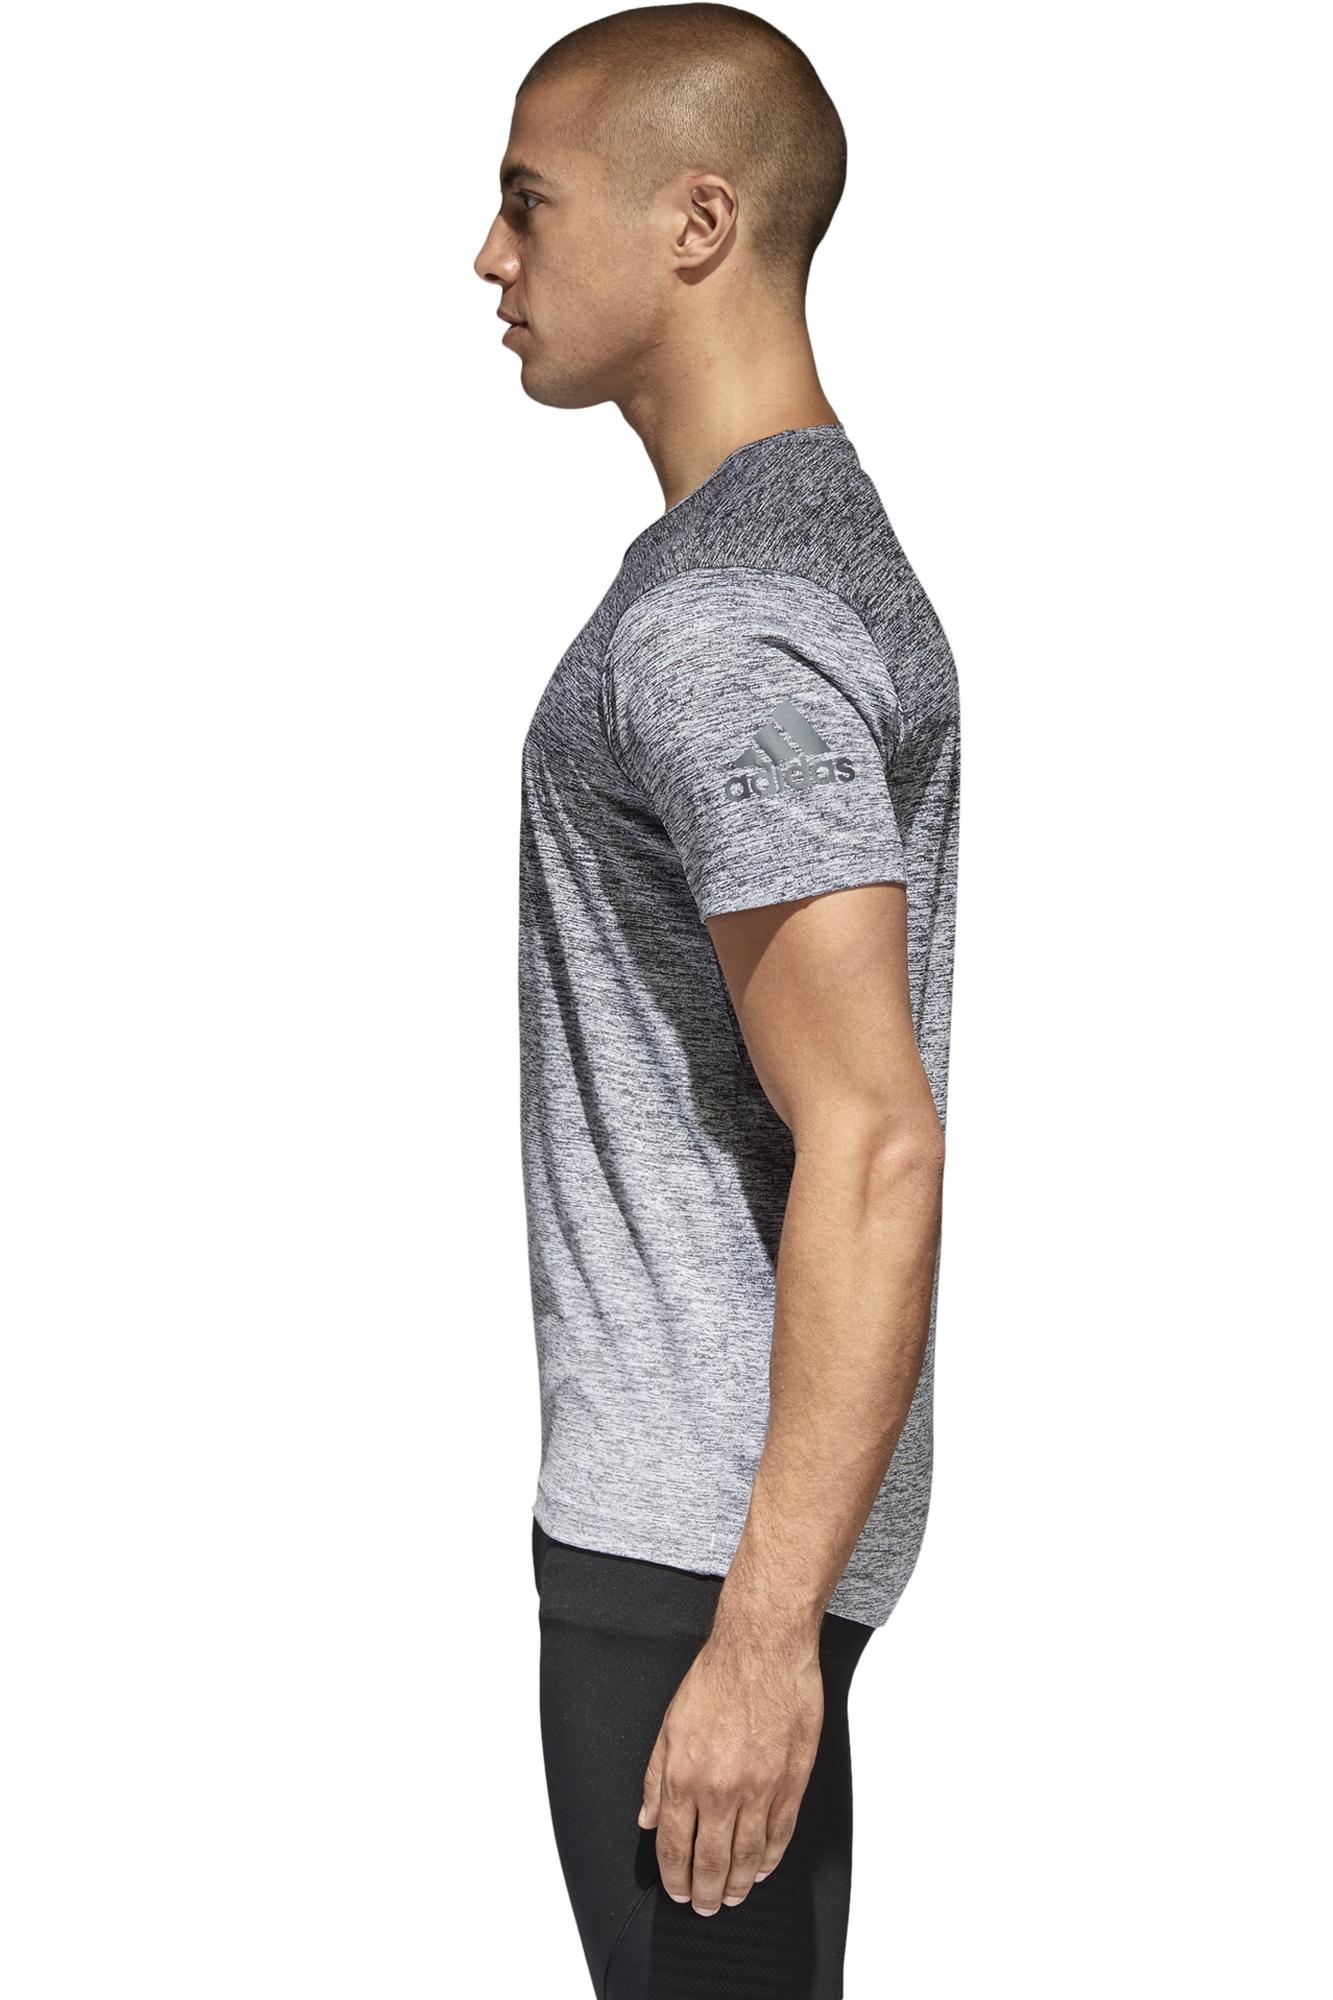 c2d22bba6c7b03 Koszulka adidas FreeLift Gradient - CW3435 / T-shirt / Odzież ...